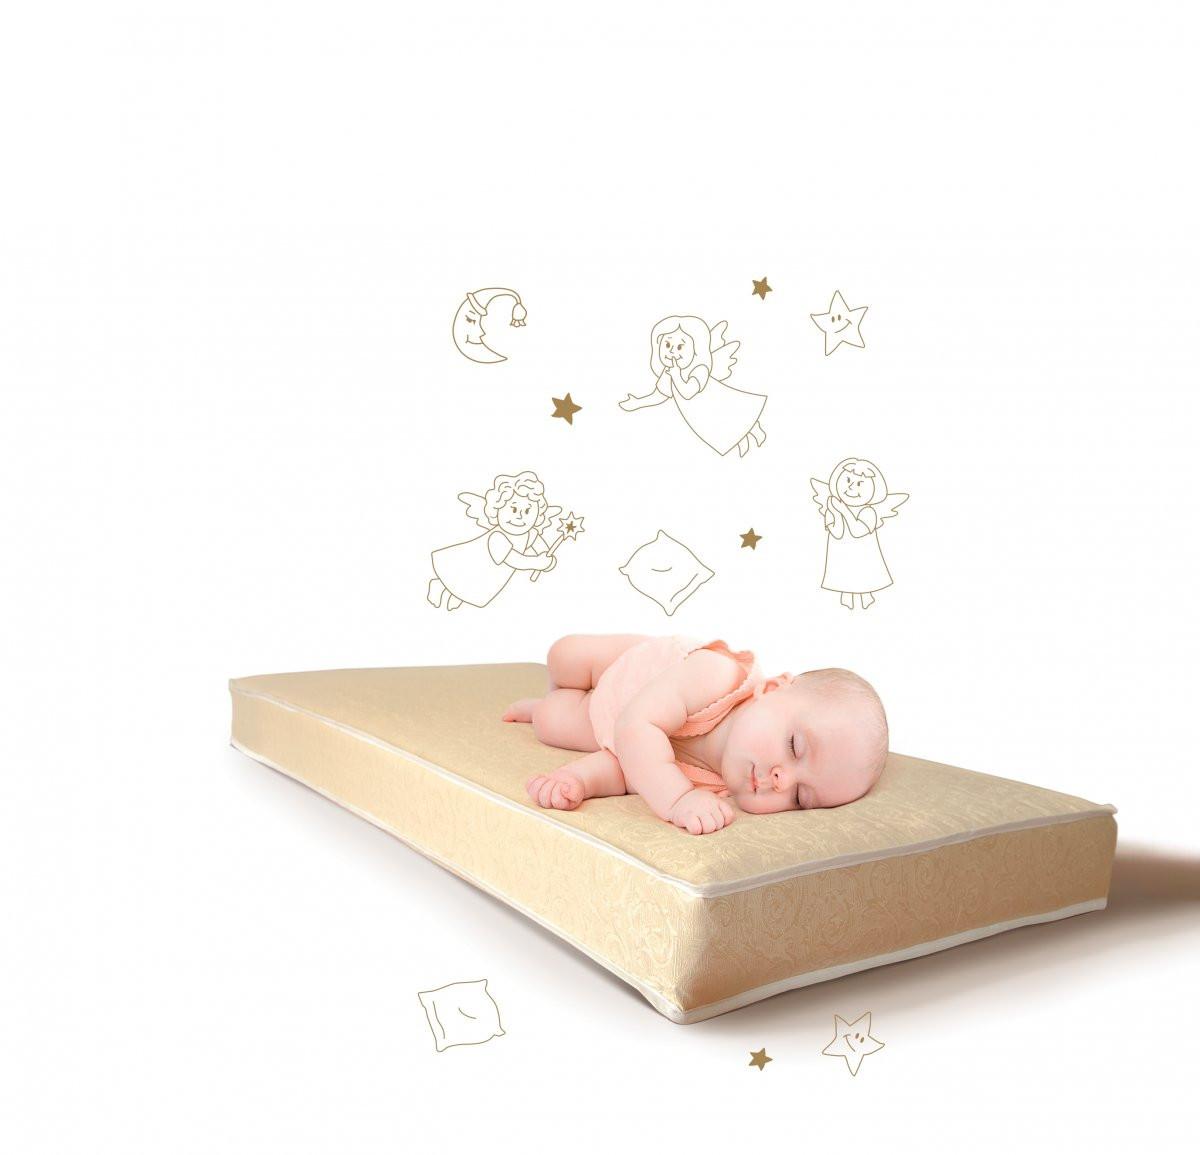 Матрас в кроватку «Холлофайбер» (6 см), Lux Baby